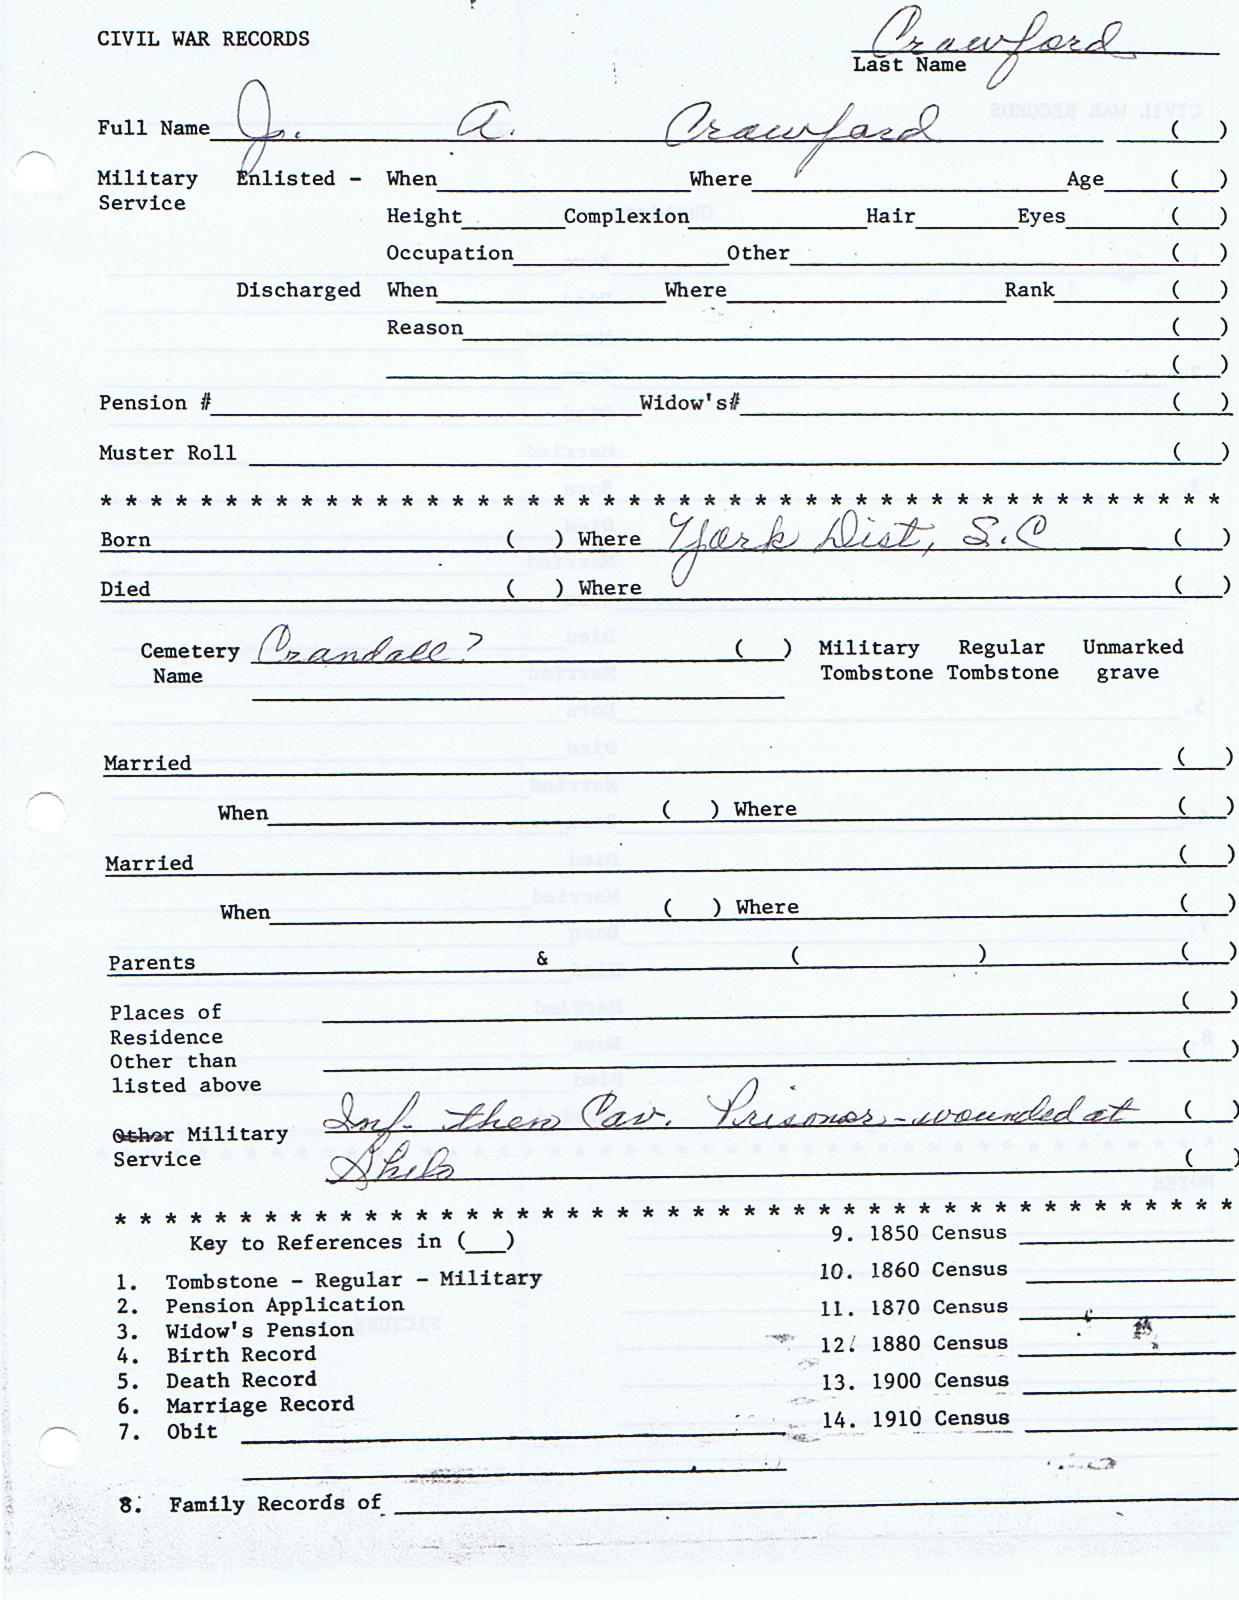 crawford-kaufman_civil_war_records-3560